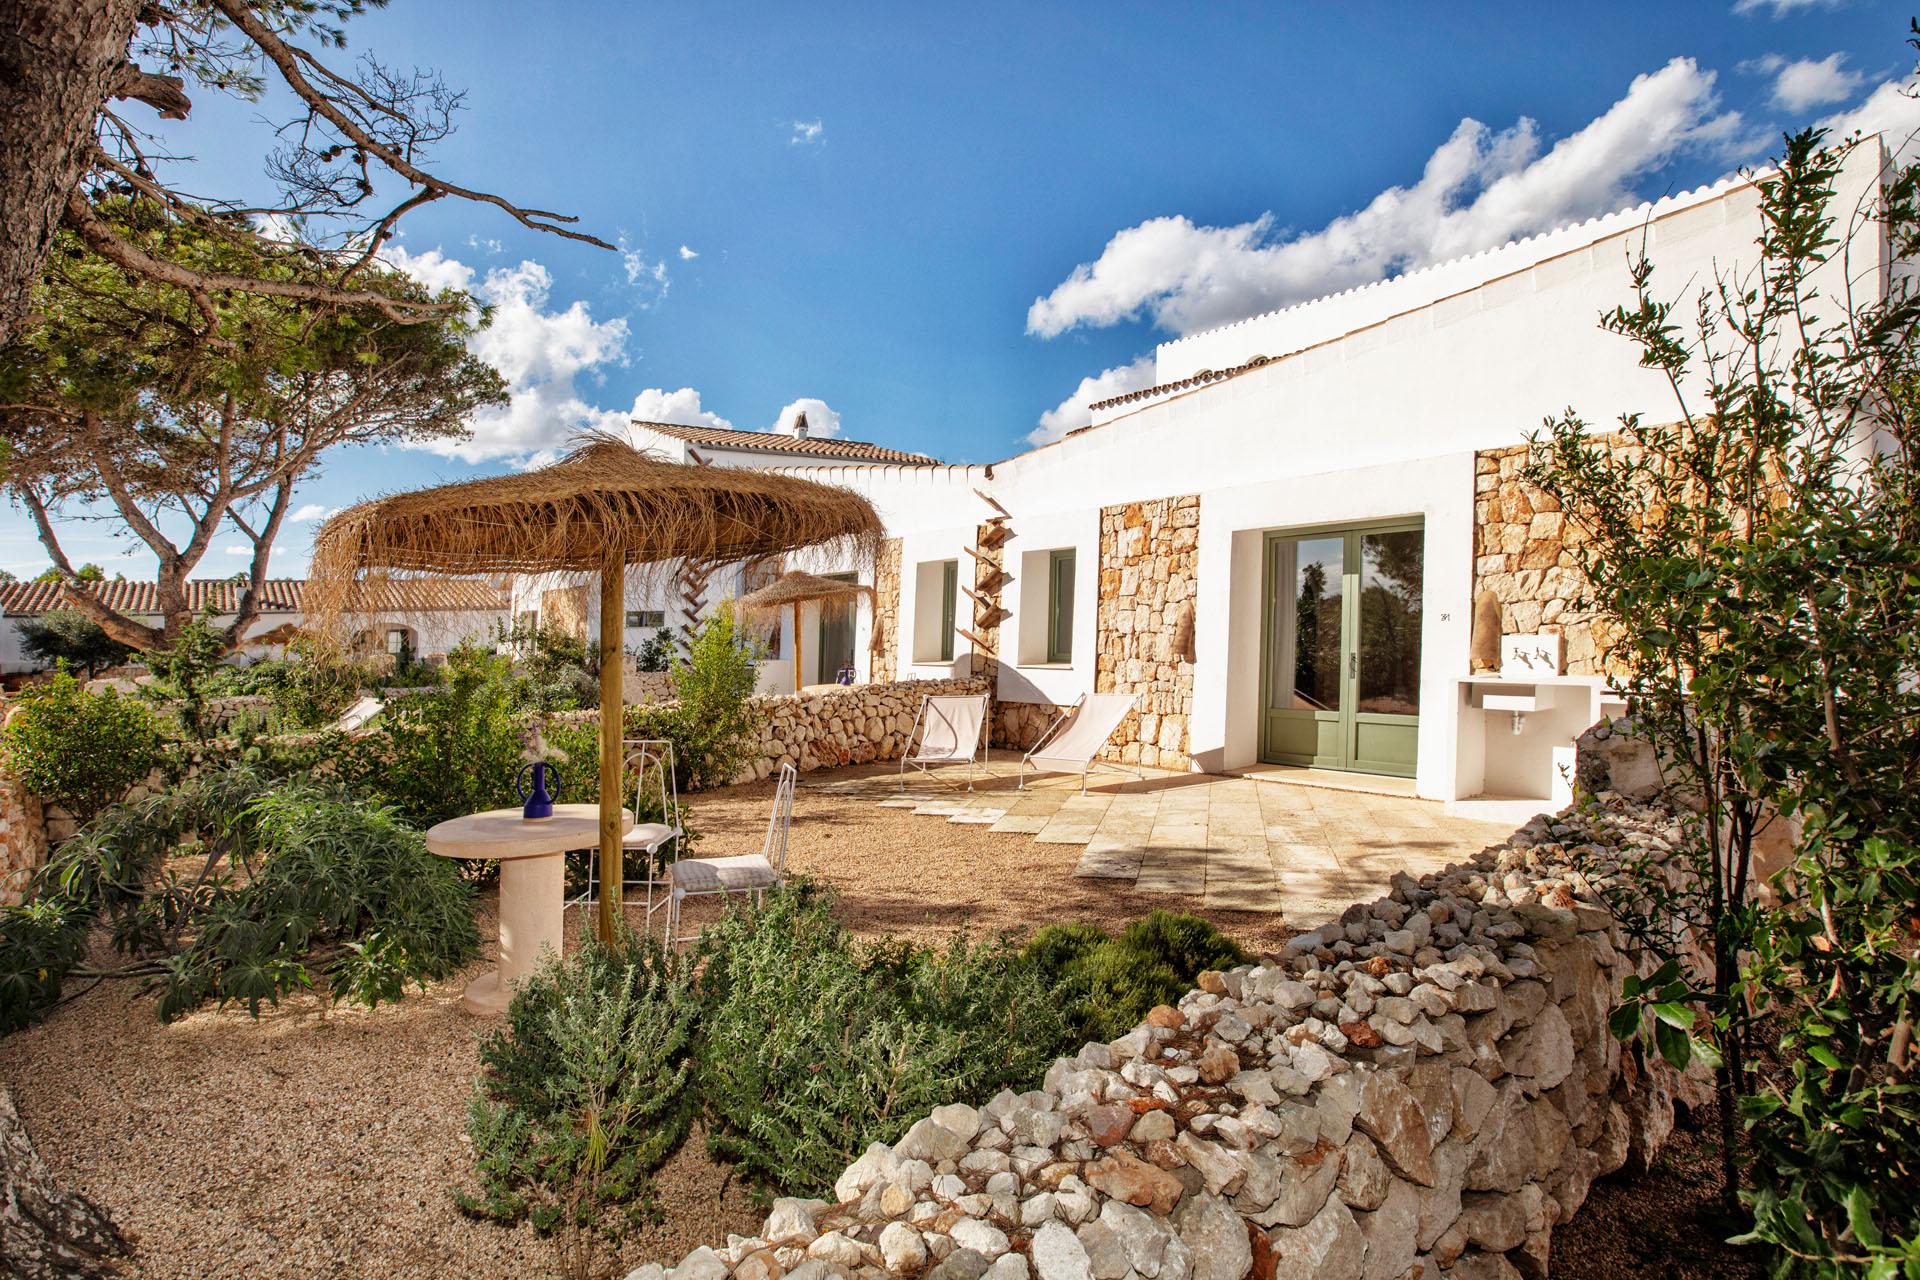 Habitación Mahon Garden 5 hotel experimental de Menorca